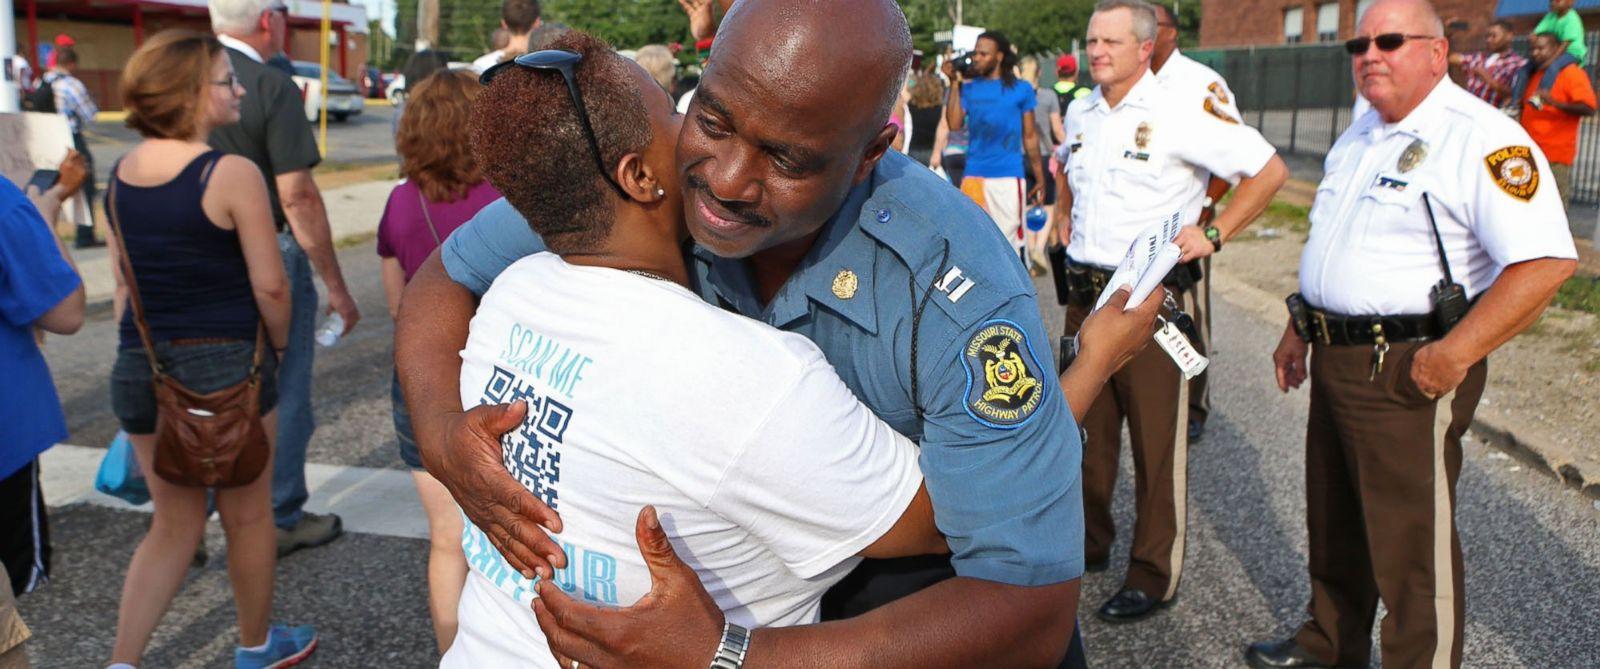 PHOTO: Capt. Ronald Johnson of the Missouri Highway Patrol hugs Angela Whitman, of Berkeley, Mo., on West Florissant Avenue in Ferguson, Mo., Aug. 14, 2014.